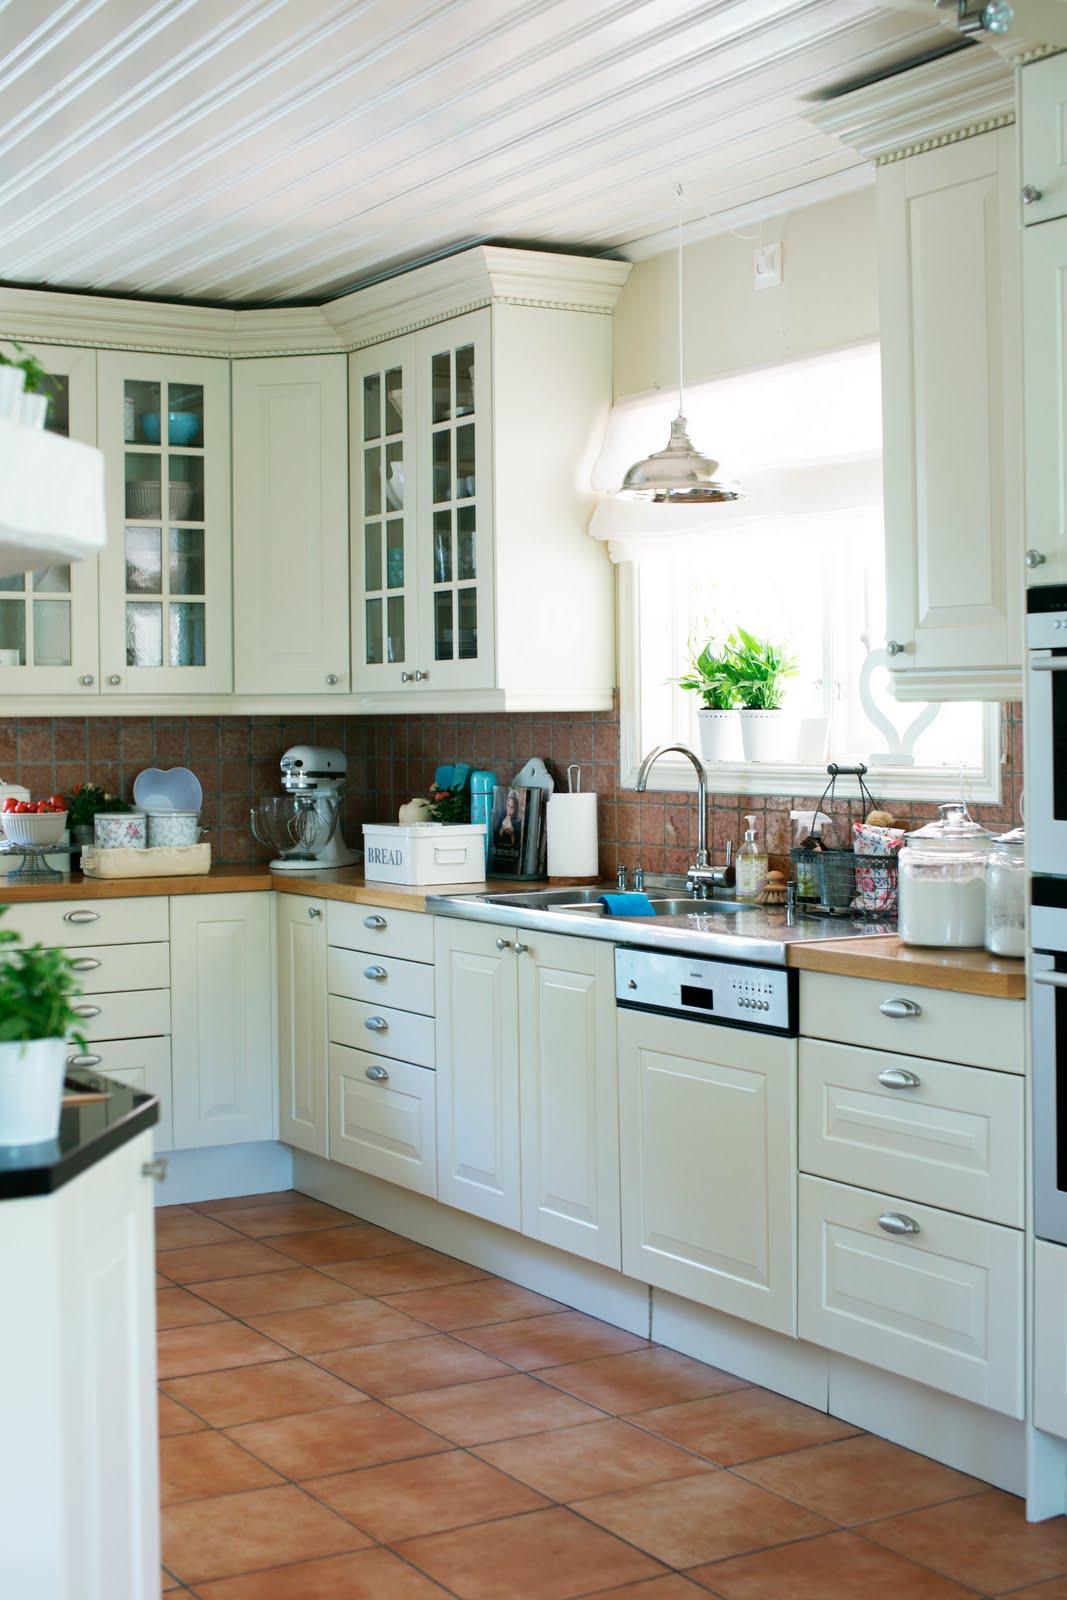 Cucina con finestra ek79 regardsdefemmes for Finestra 4 tolmezzo